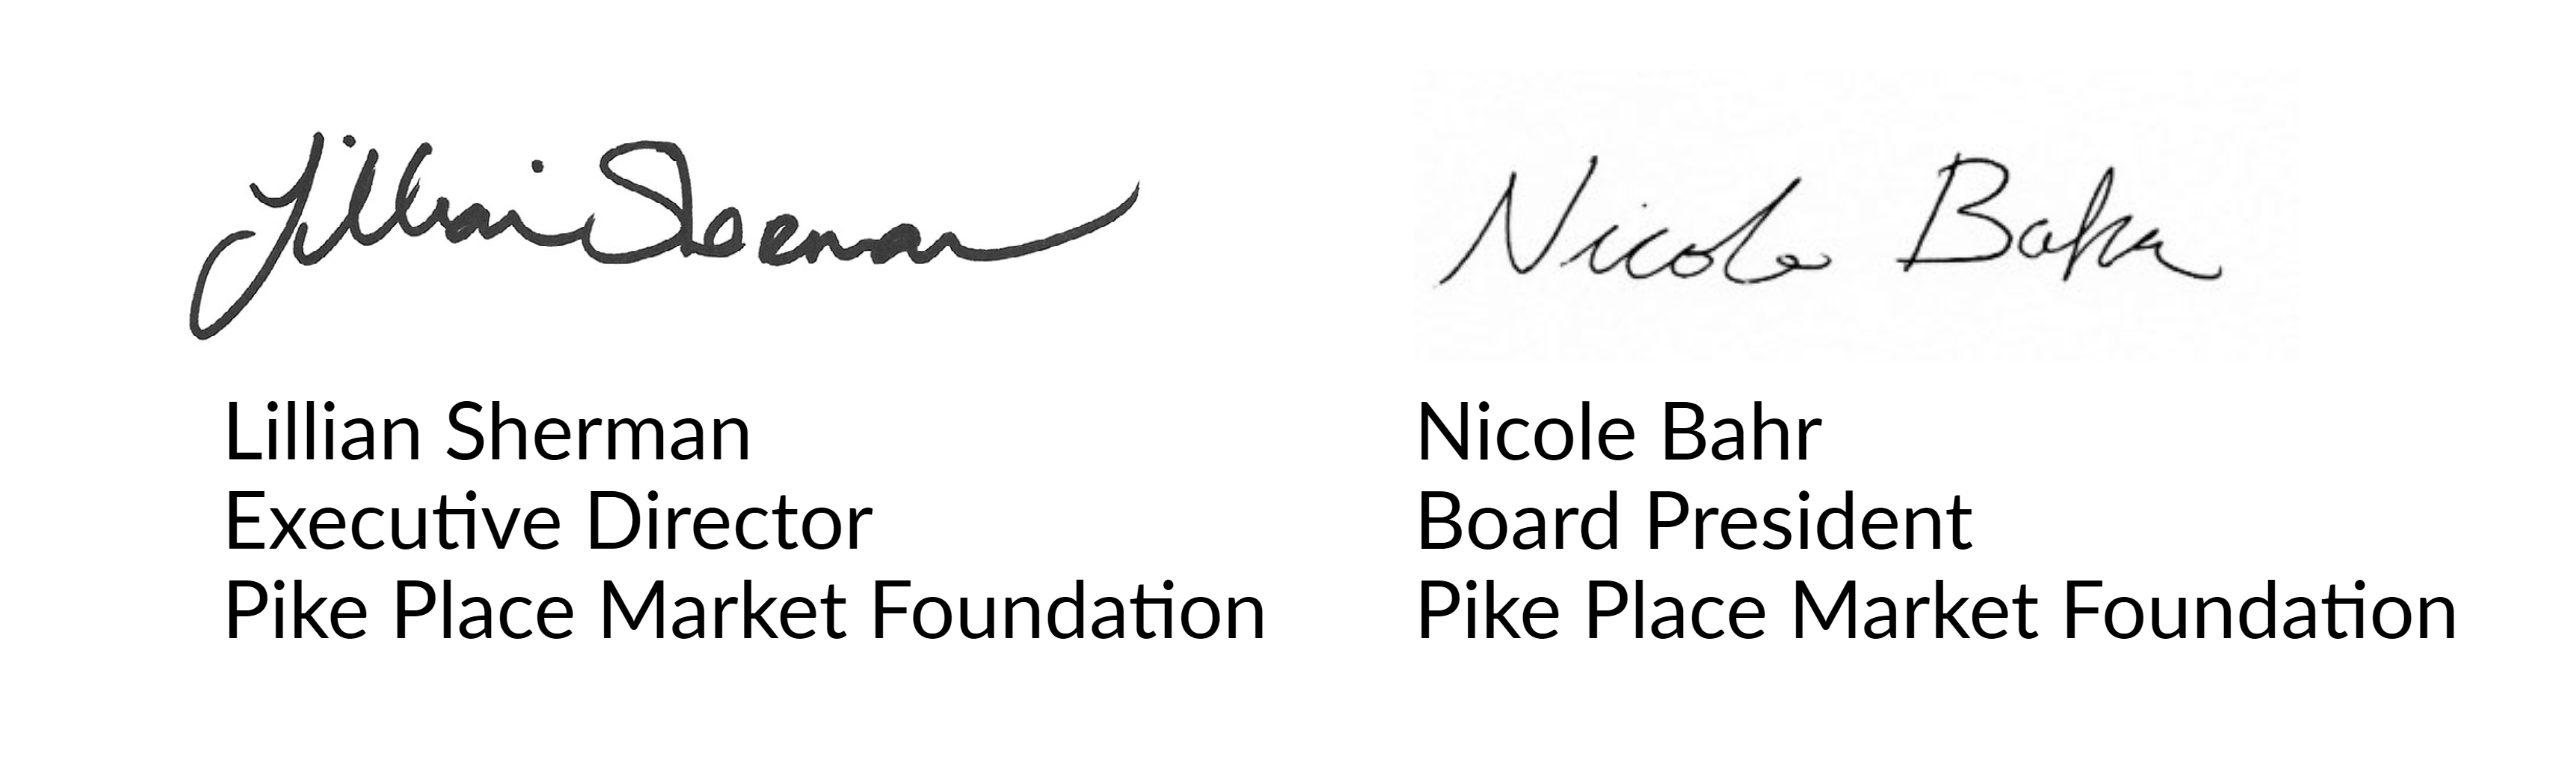 Lillian and Nicole signatures